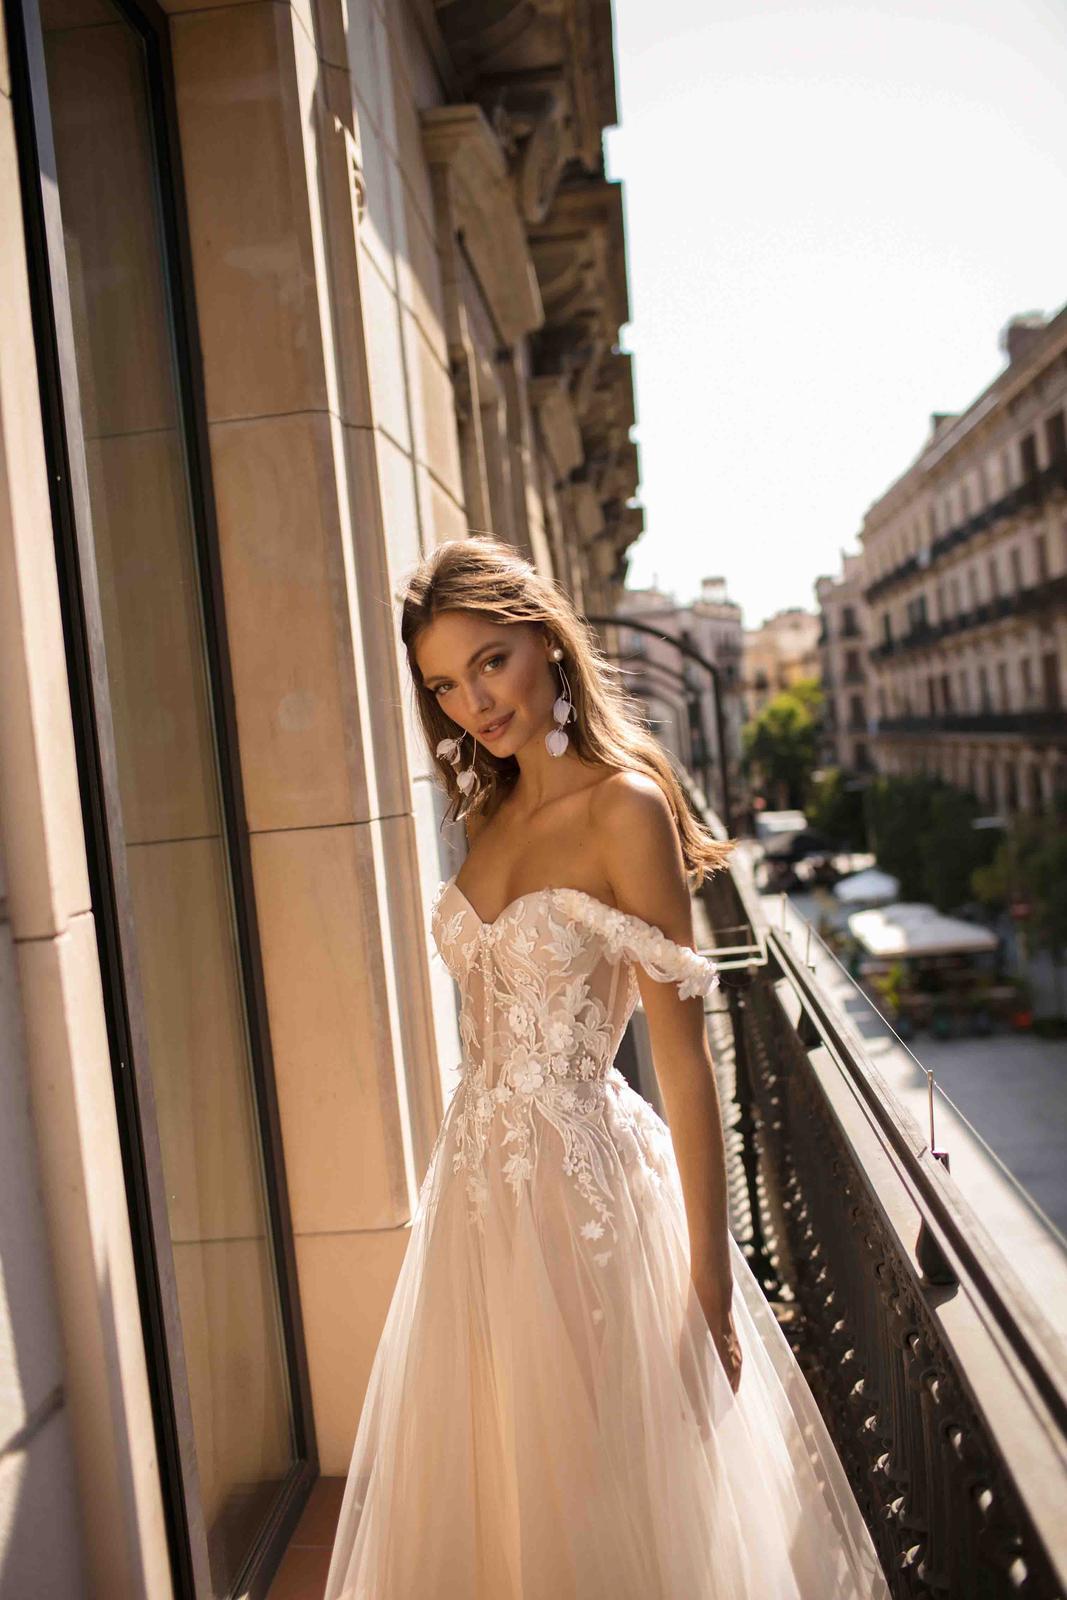 Muse by Berta * Svadobné šaty z kolekcií na rok 2019 - Obrázok č. 9